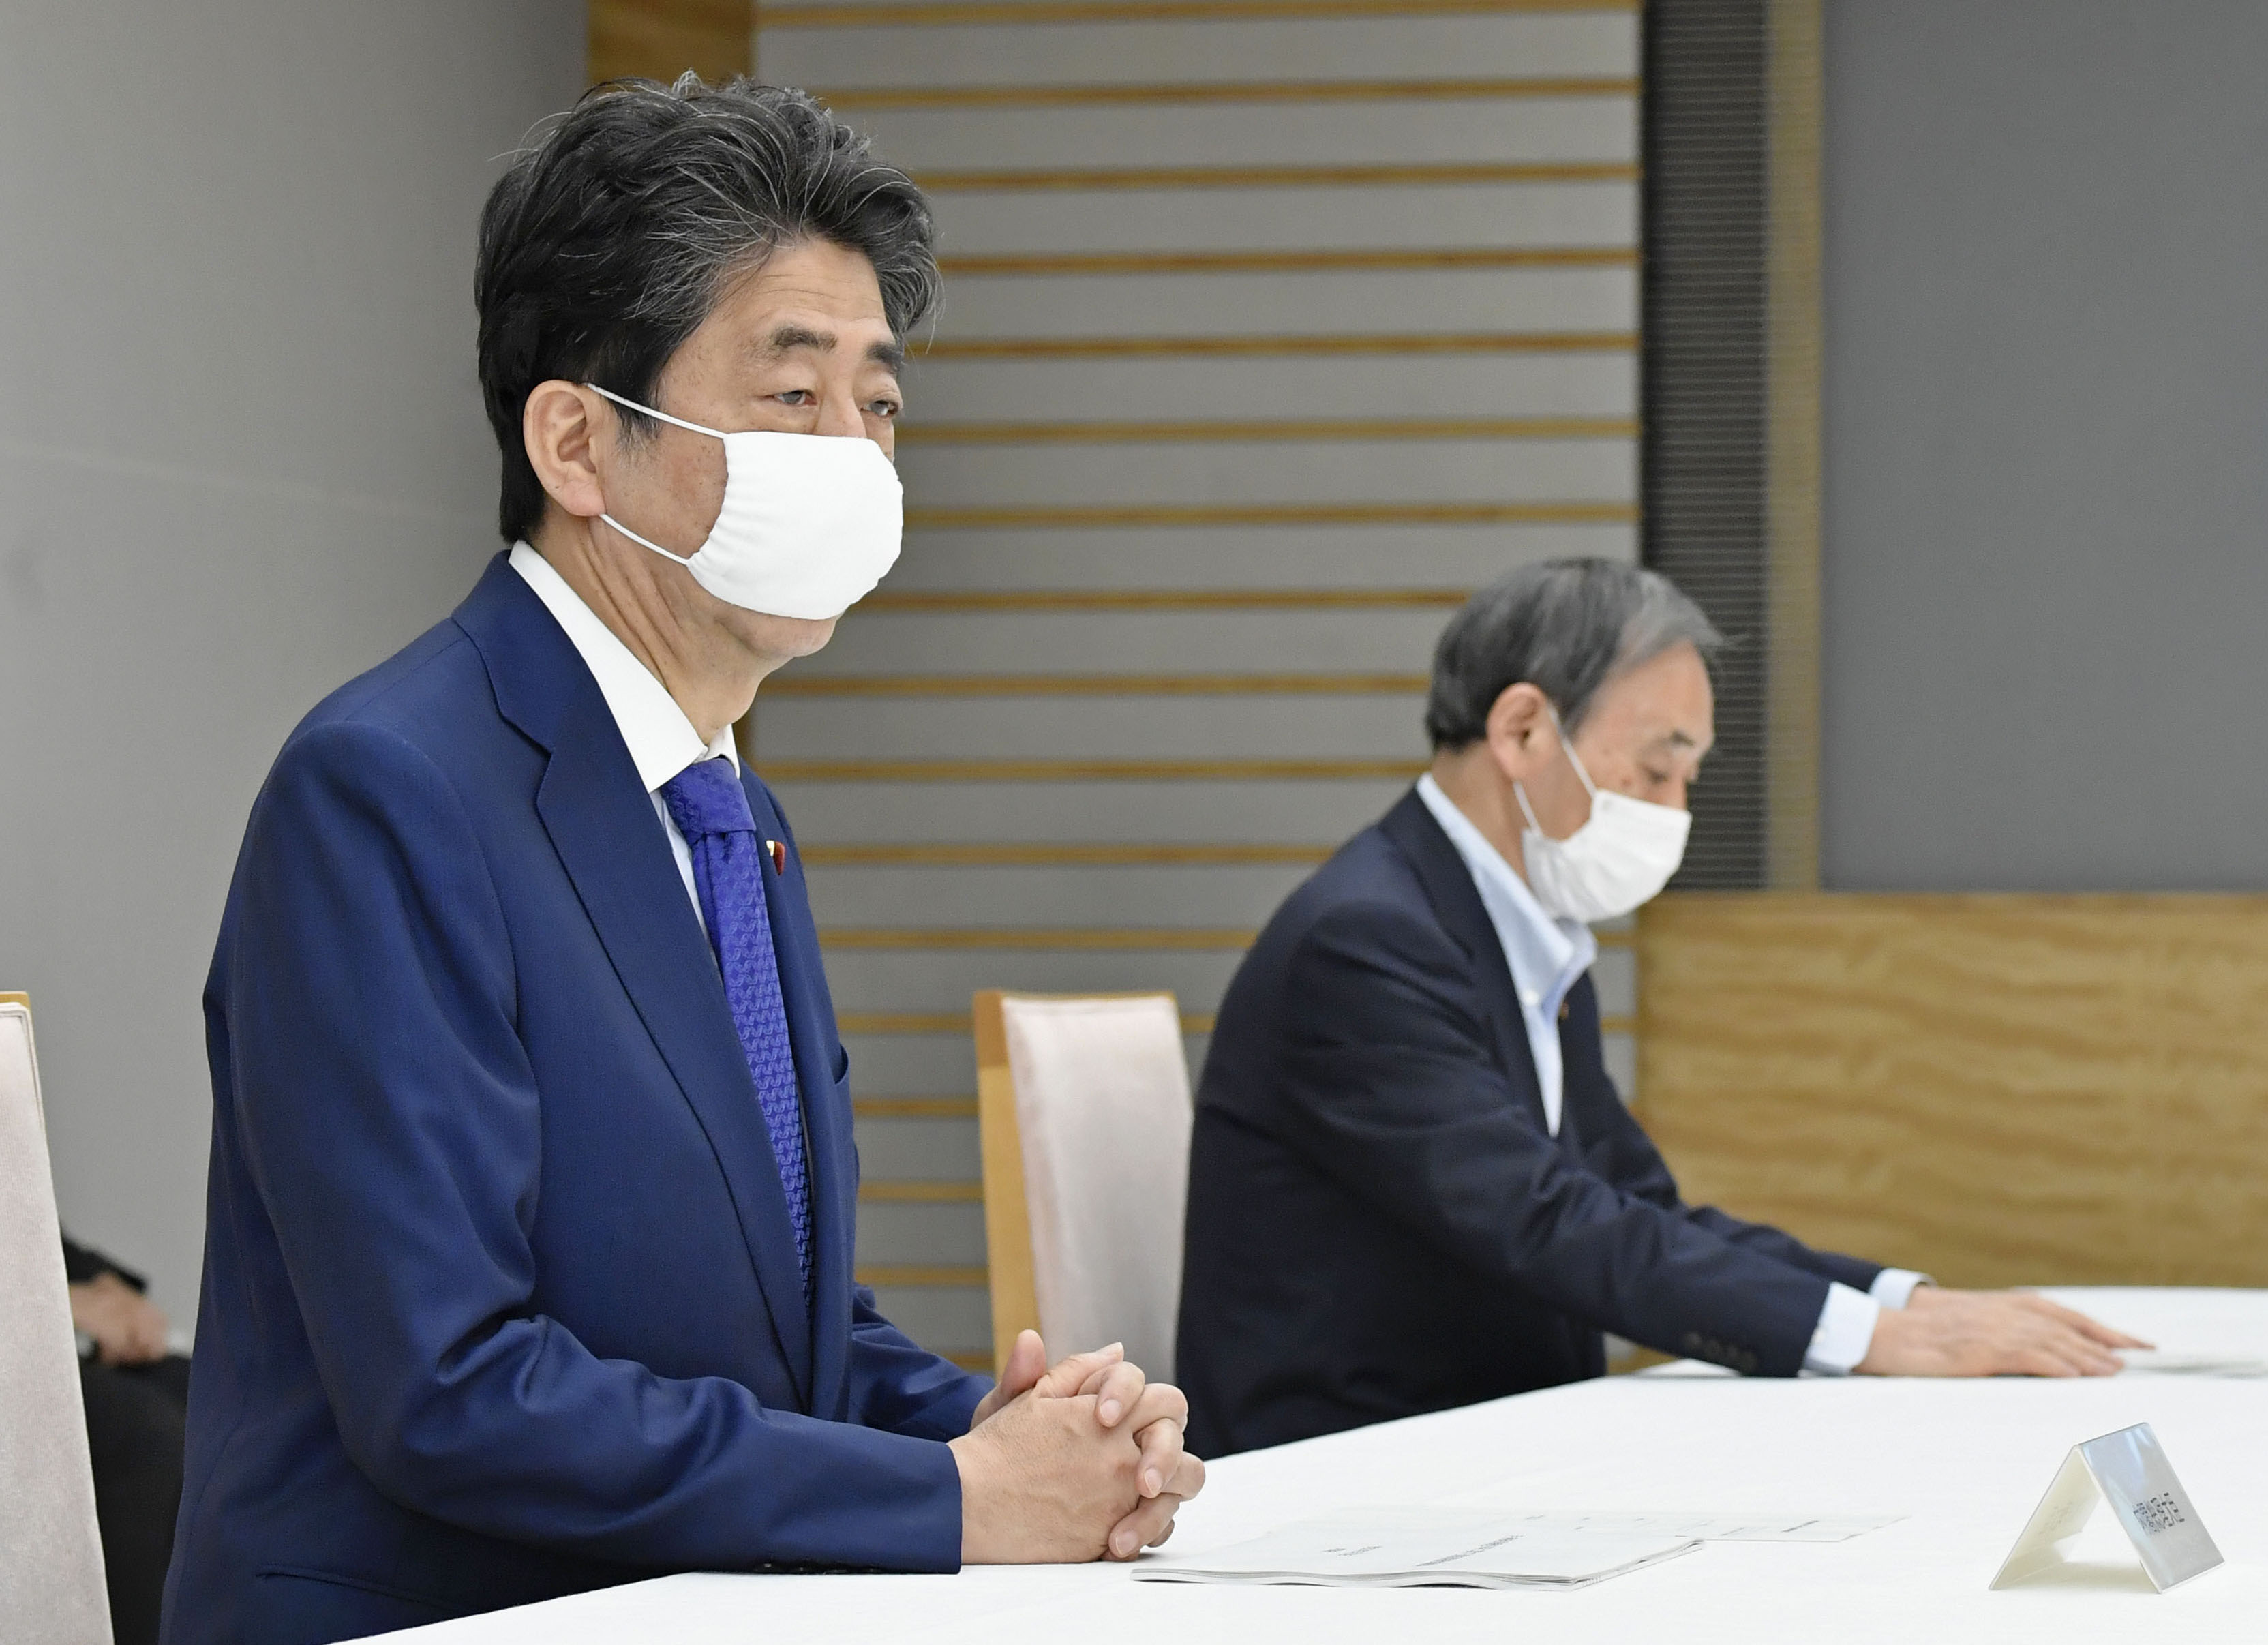 月例経済報告関係閣僚会議に臨む安倍首相(左)と菅官房長官=28日午後、首相官邸